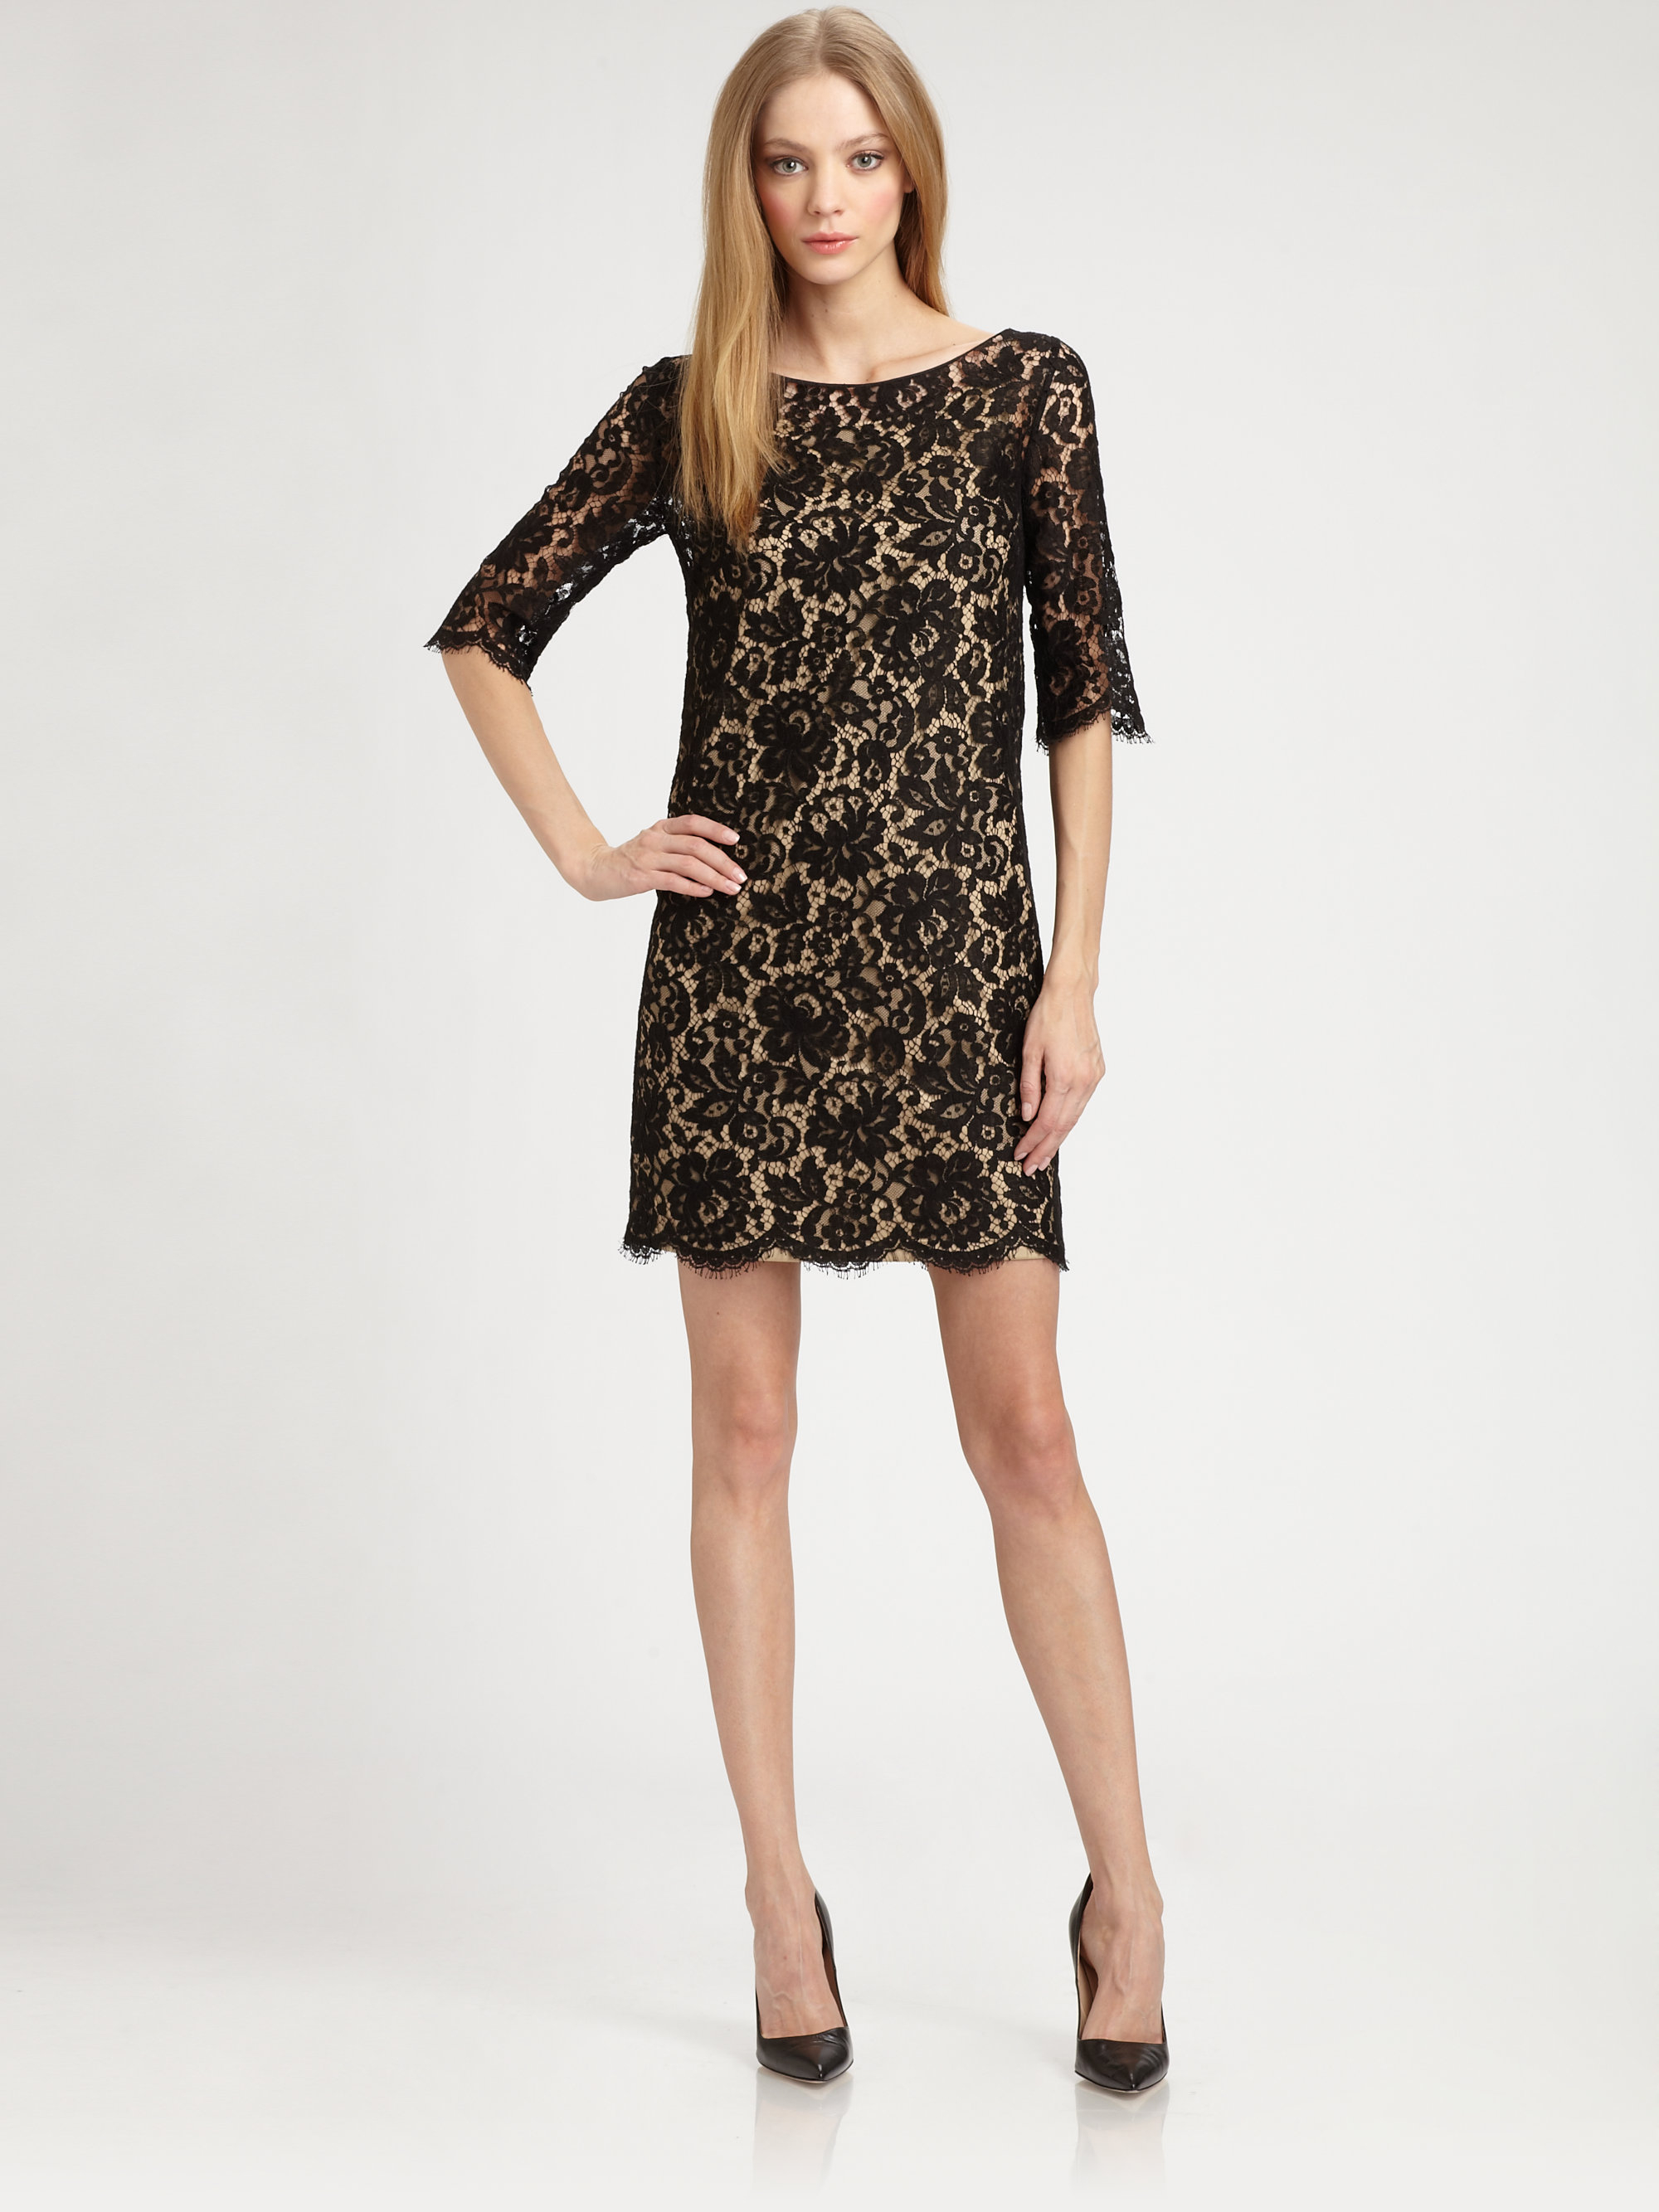 27eeb659fe4f Robert Rodriguez Lace Shift Dress in Black - Lyst